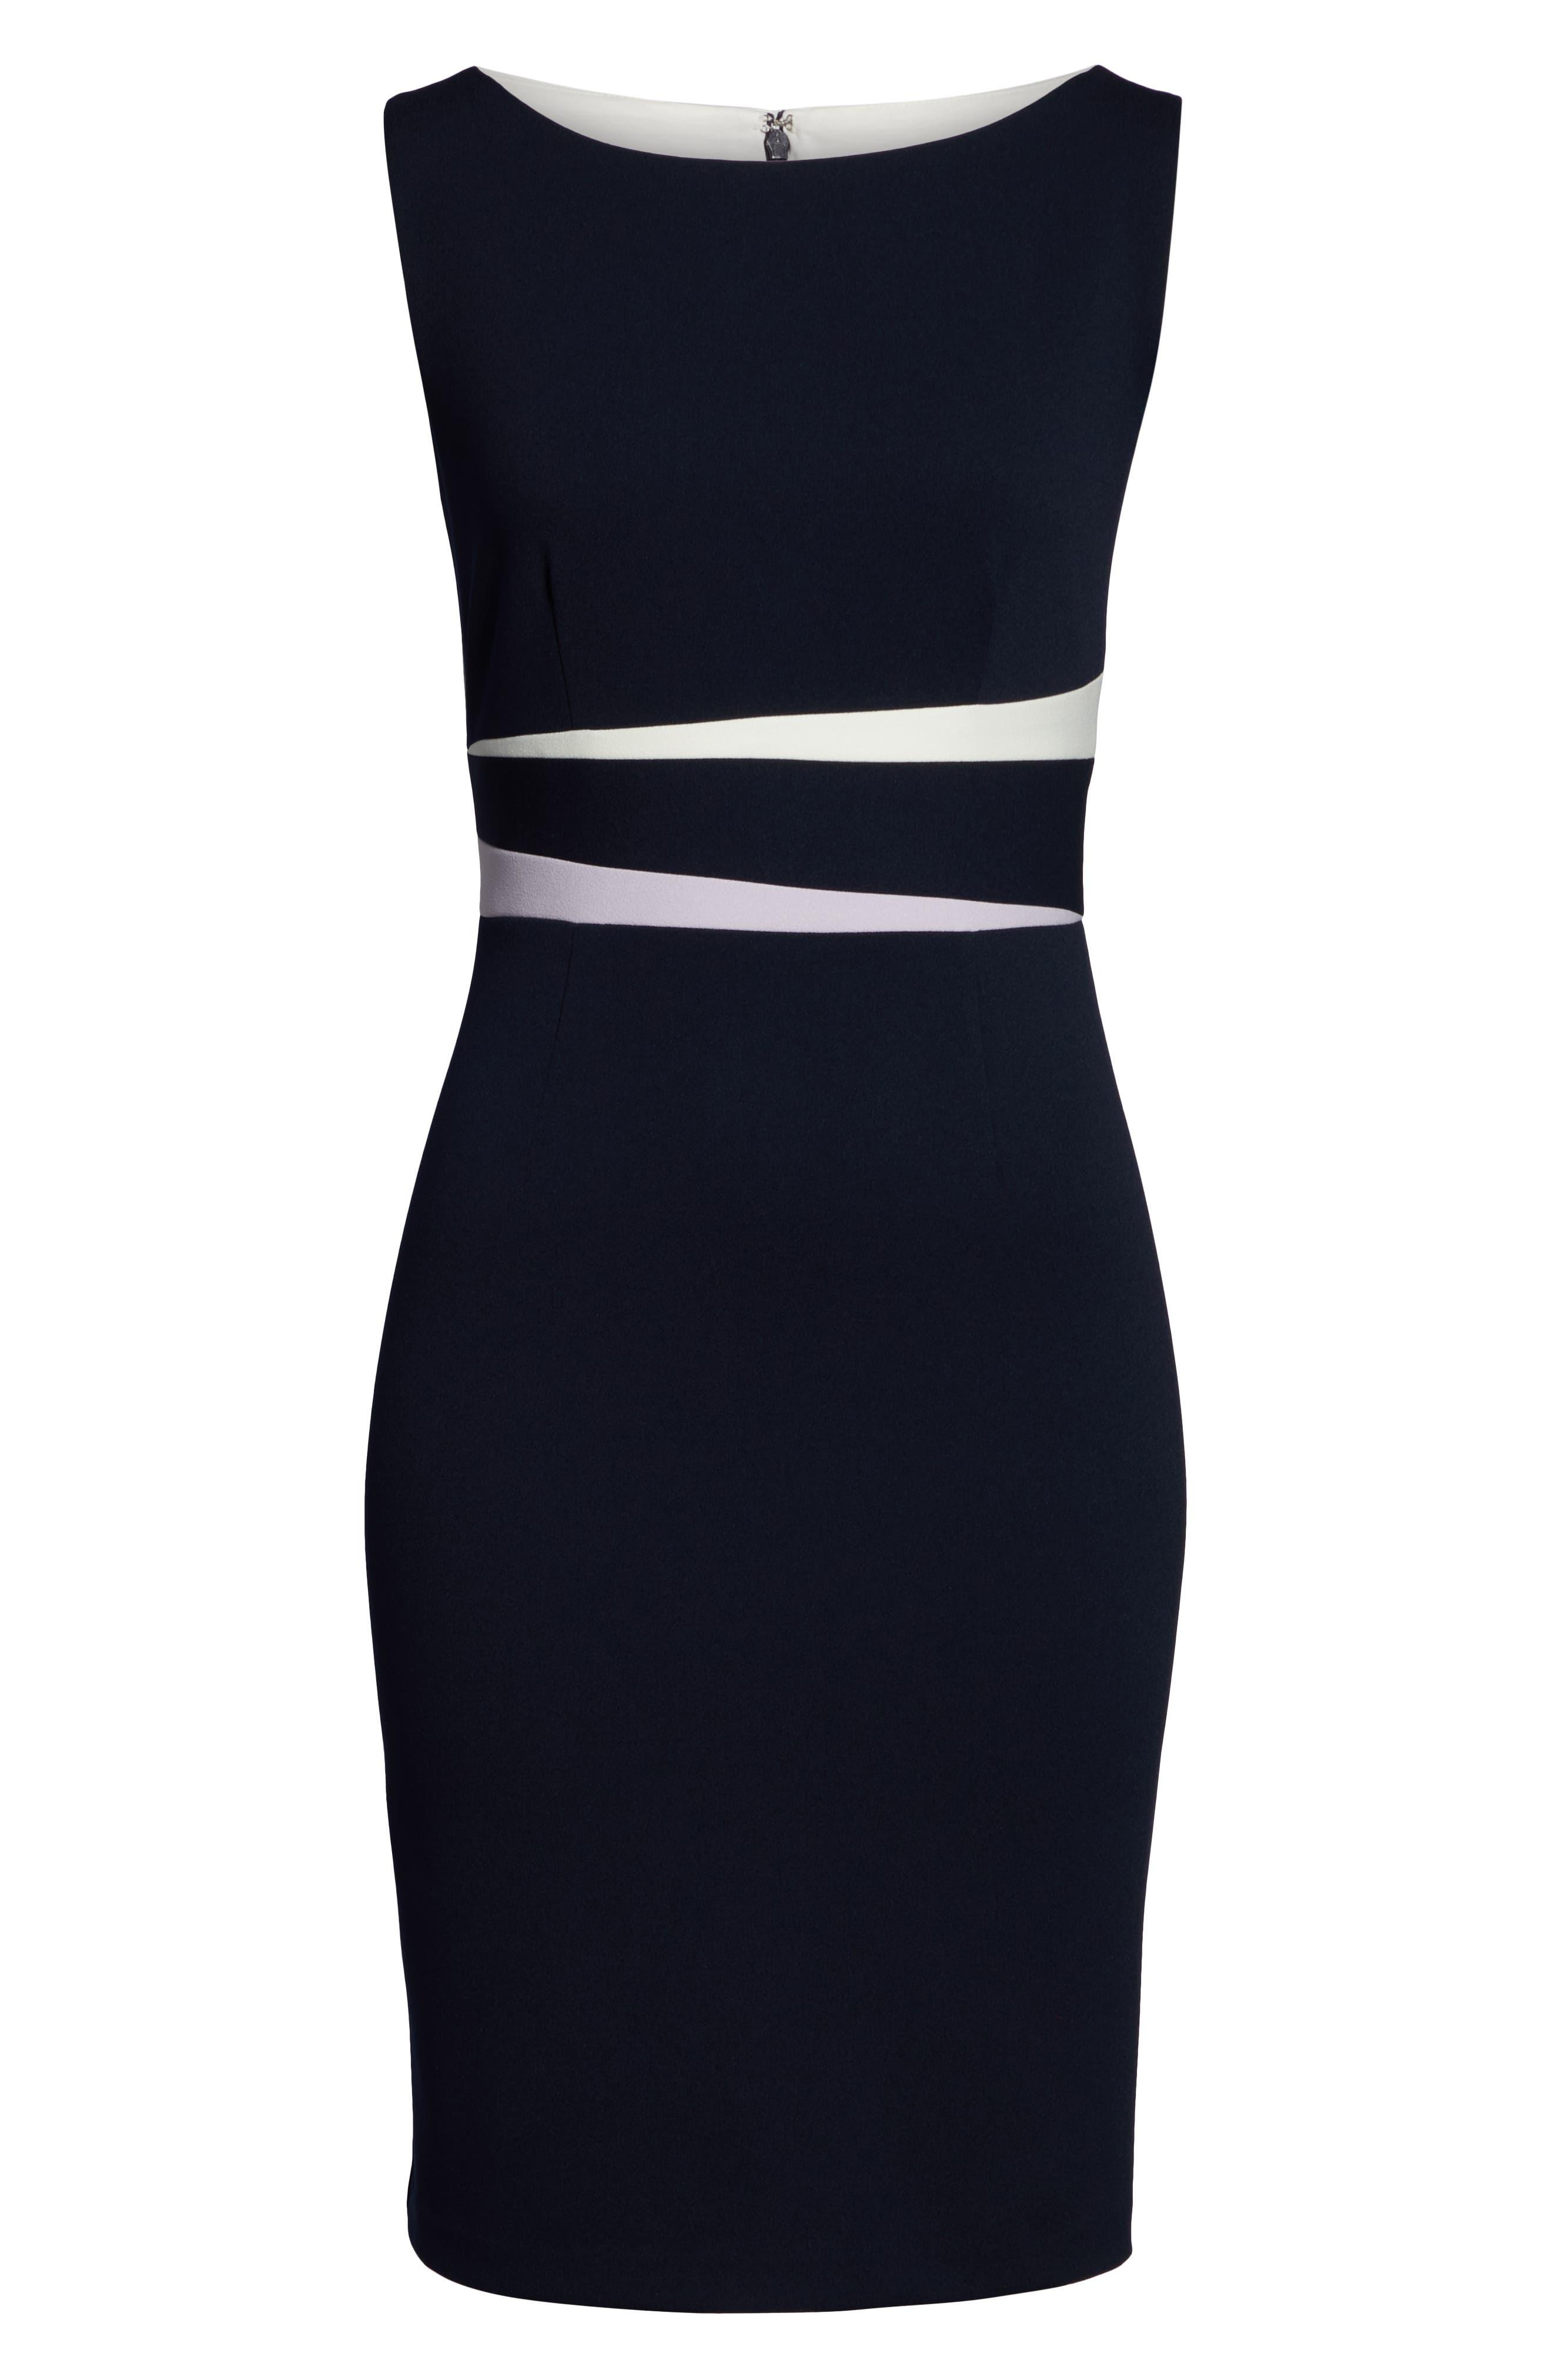 VINCE CAMUTO,                             Colorblock Sheath Dress,                             Alternate thumbnail 7, color,                             PURPLE/ BLUE